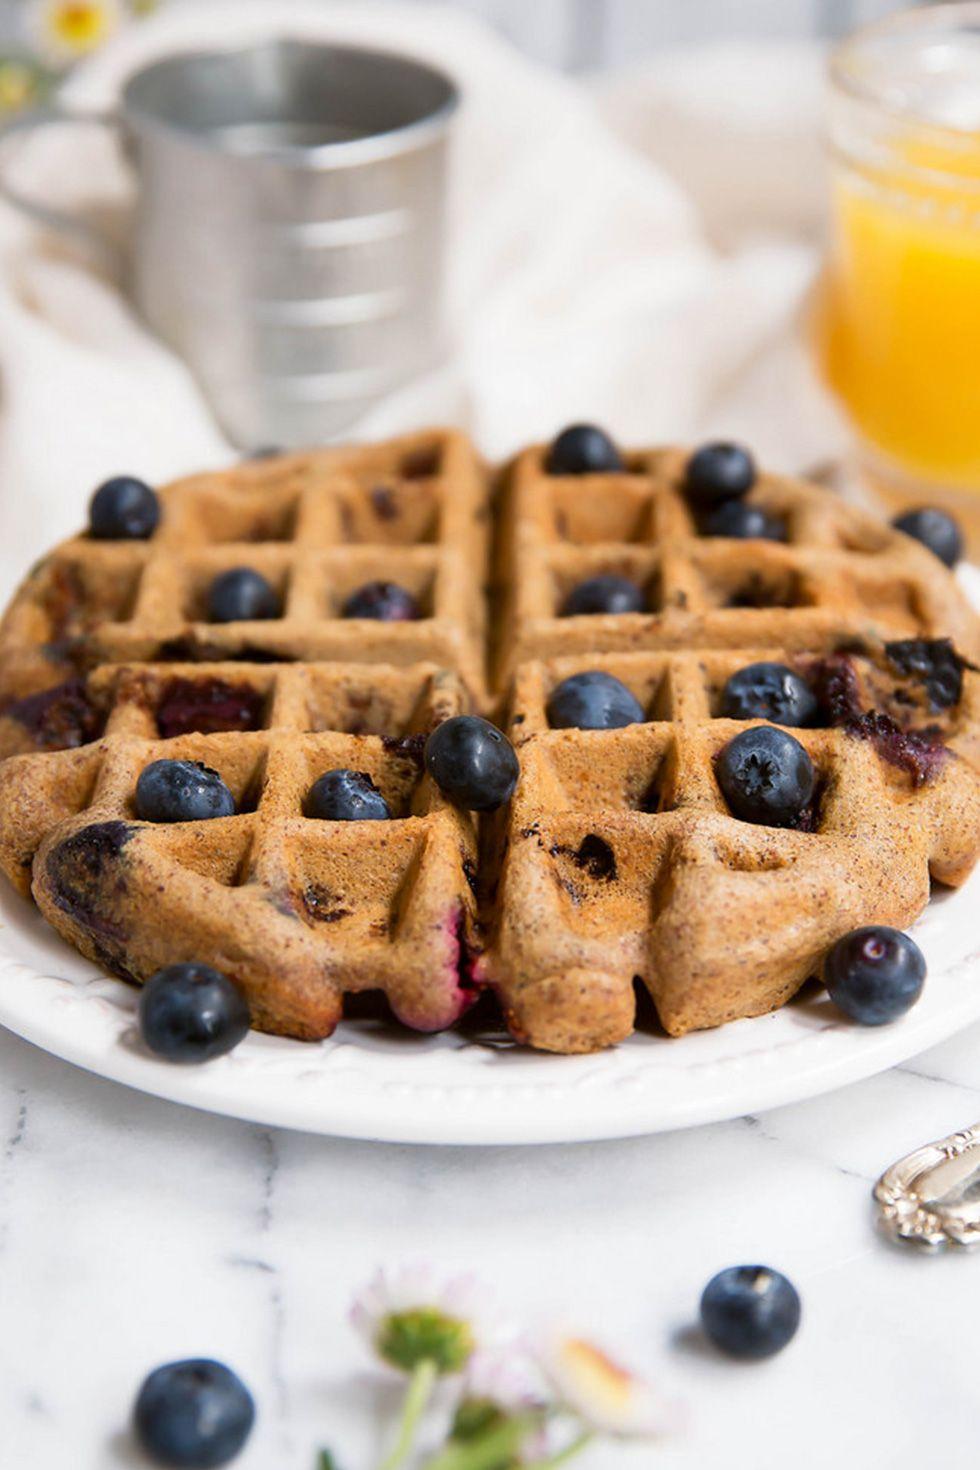 Almond Butter Paleo Blueberry Waffle